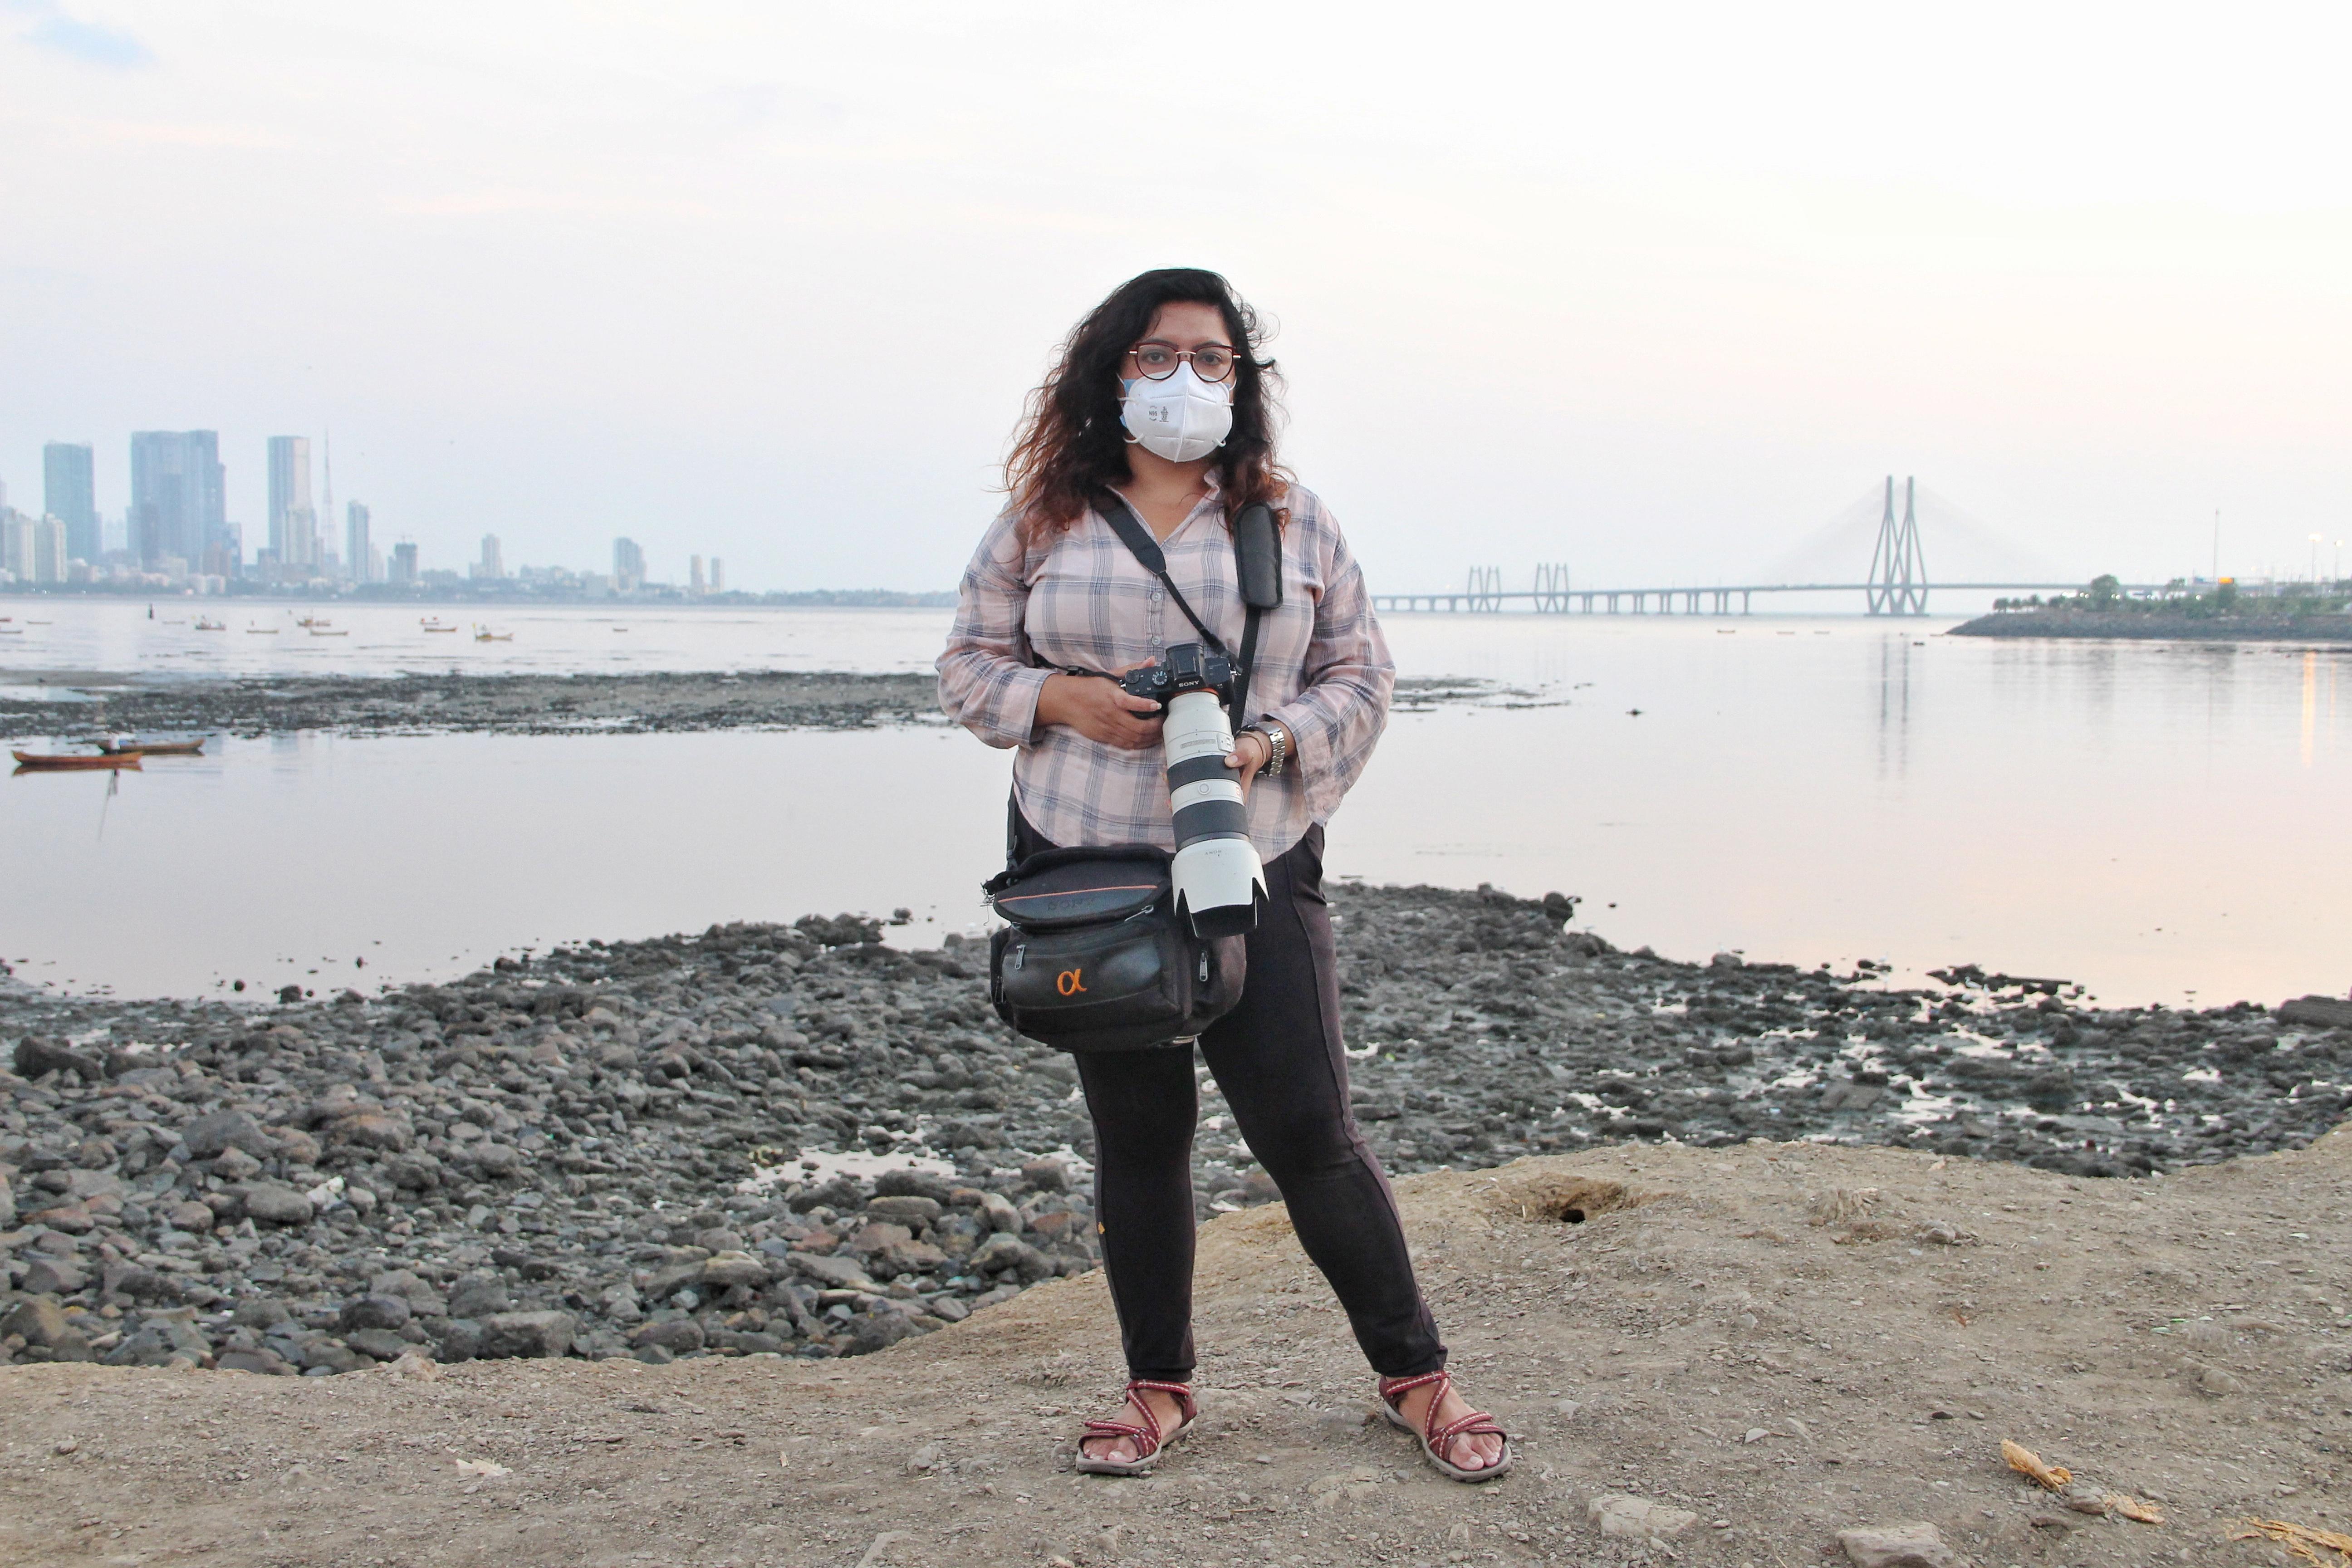 photojournalist - Hemanshi Kamashi